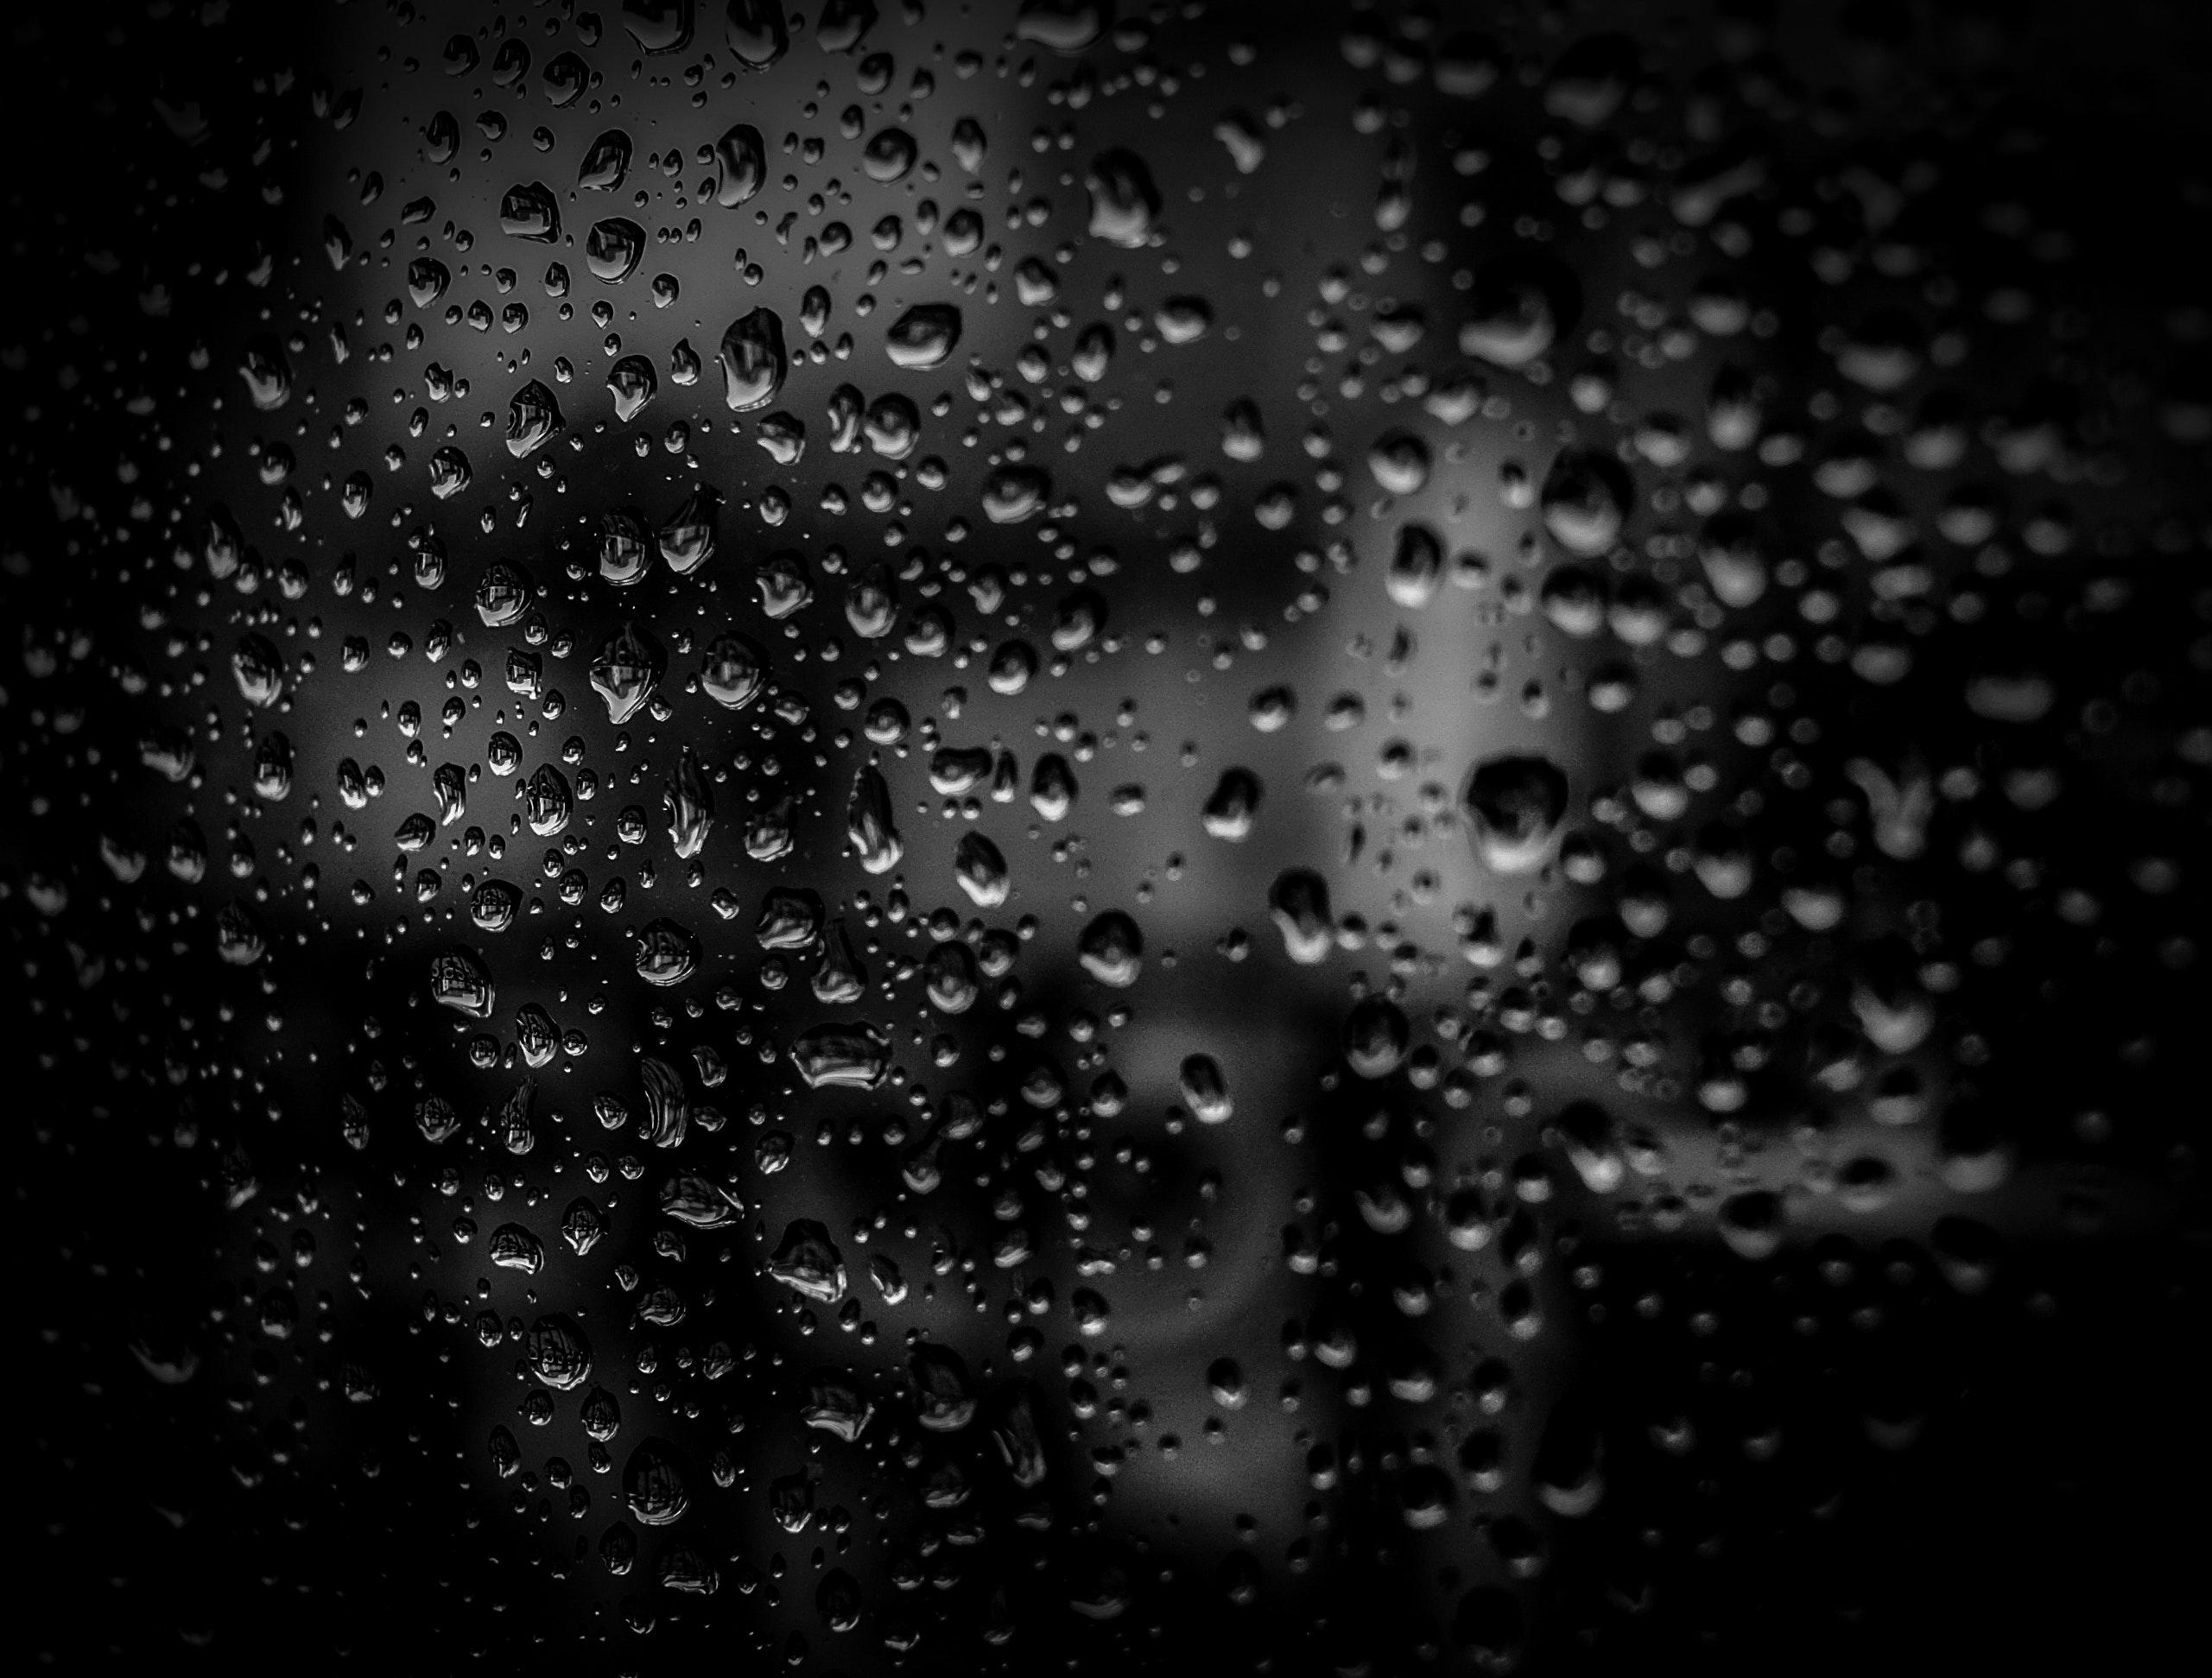 black wallpaper 183 pexels 183 free stock photos